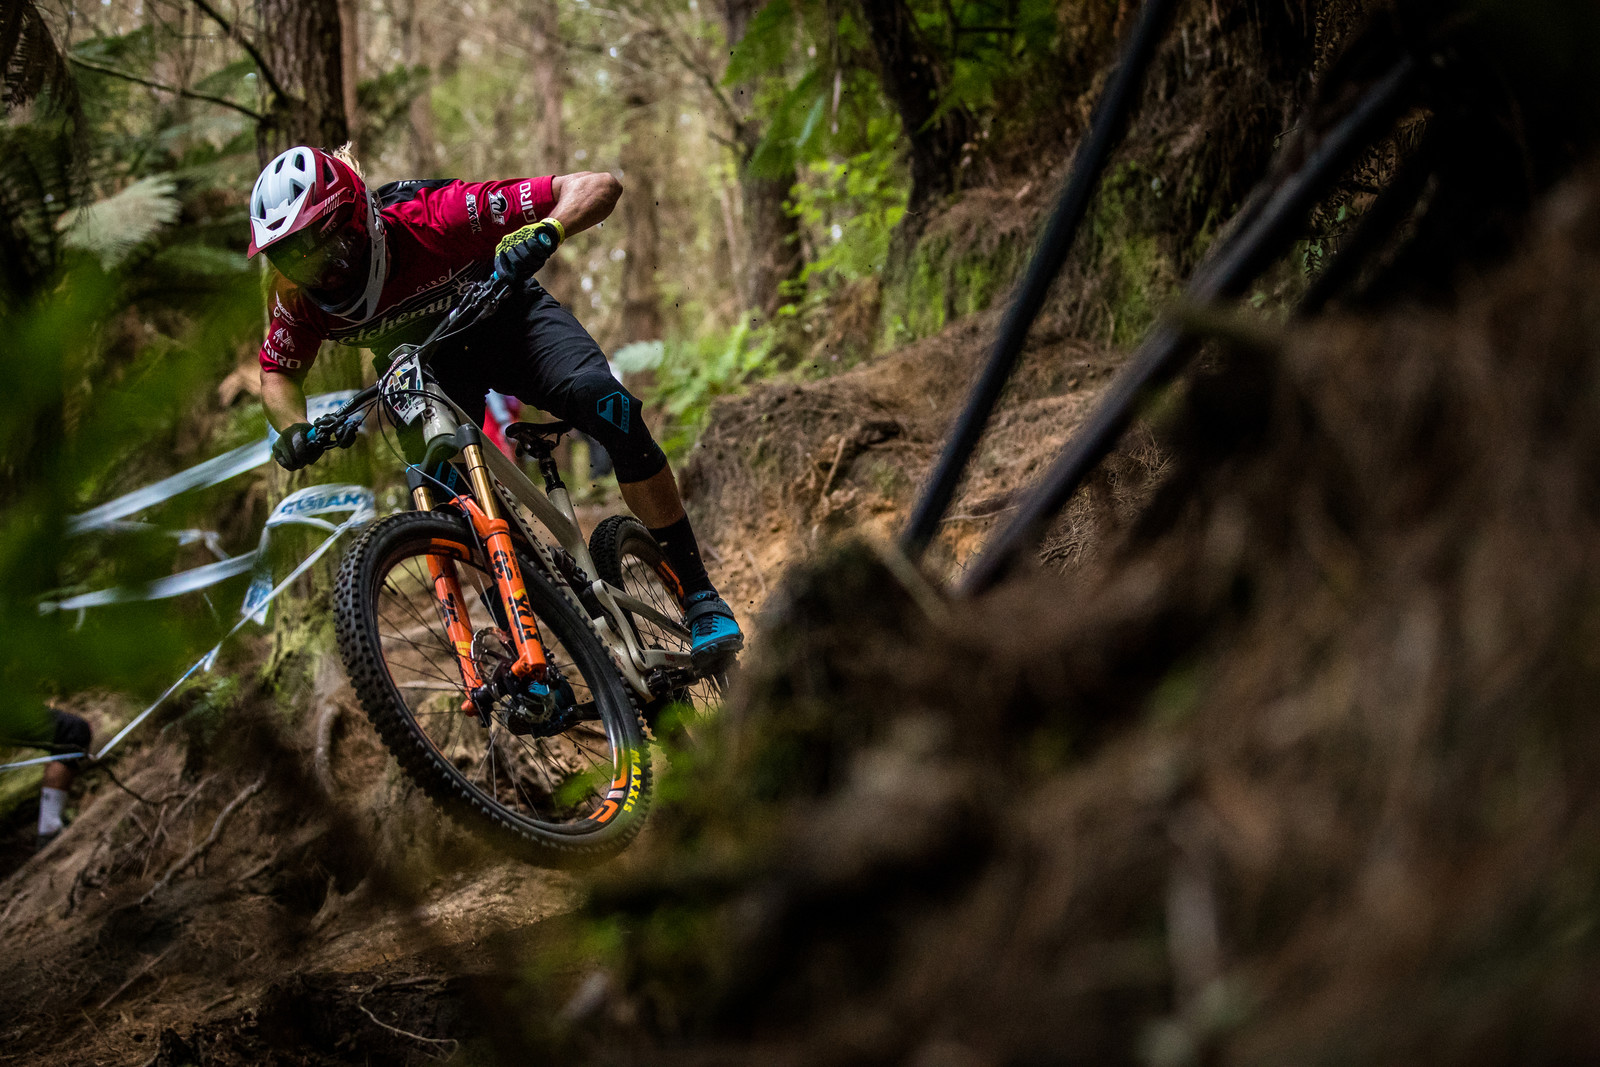 Cody Kelley - 2019 Enduro World Series Crankworx Rotorua - Mountain Biking Pictures - Vital MTB